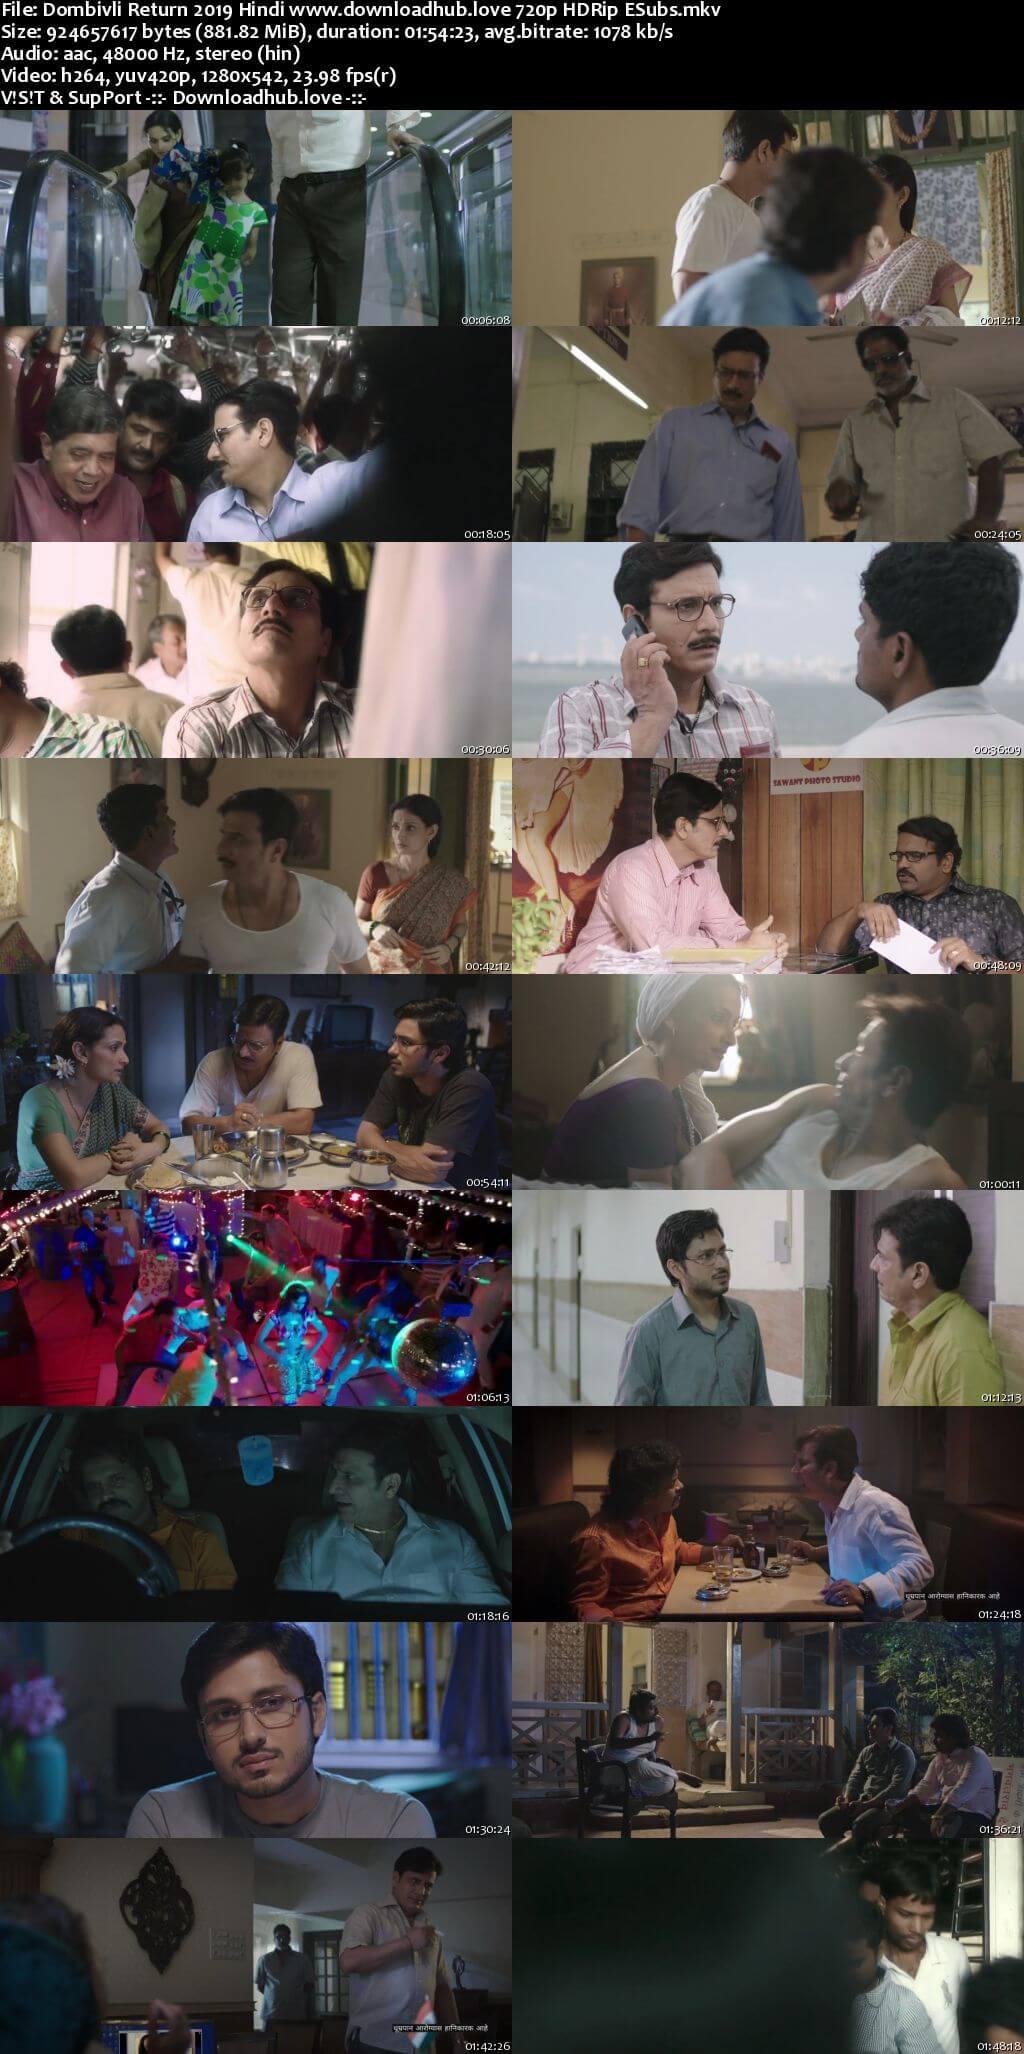 Dombivli Return 2019 Hindi 720p HDRip ESubs